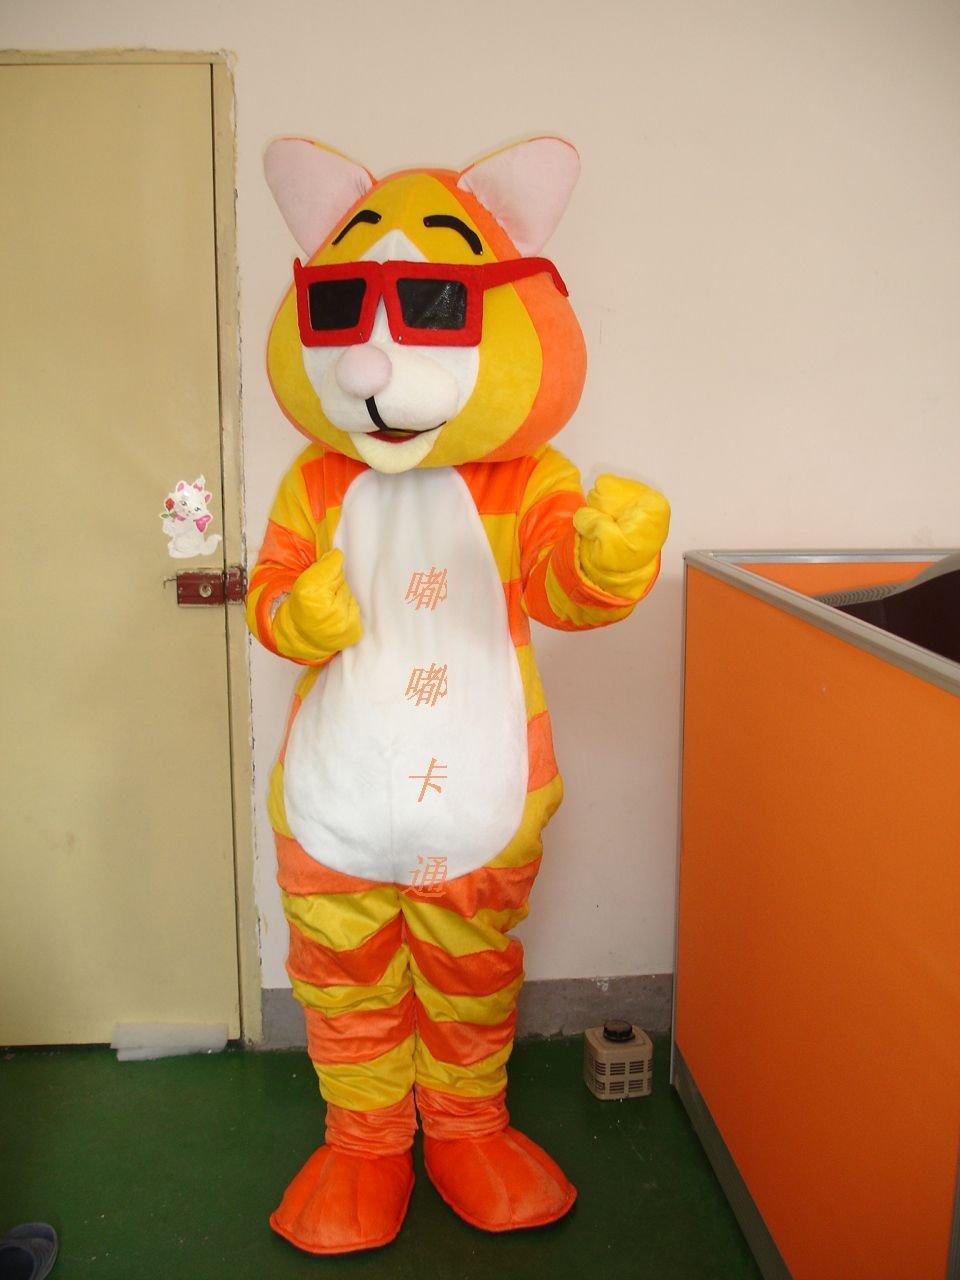 Walking Cartoon Doll Clothing Cartoon Show Clothing Cartoon Tiger Cartoon Costumes Glasses Mascot Costume